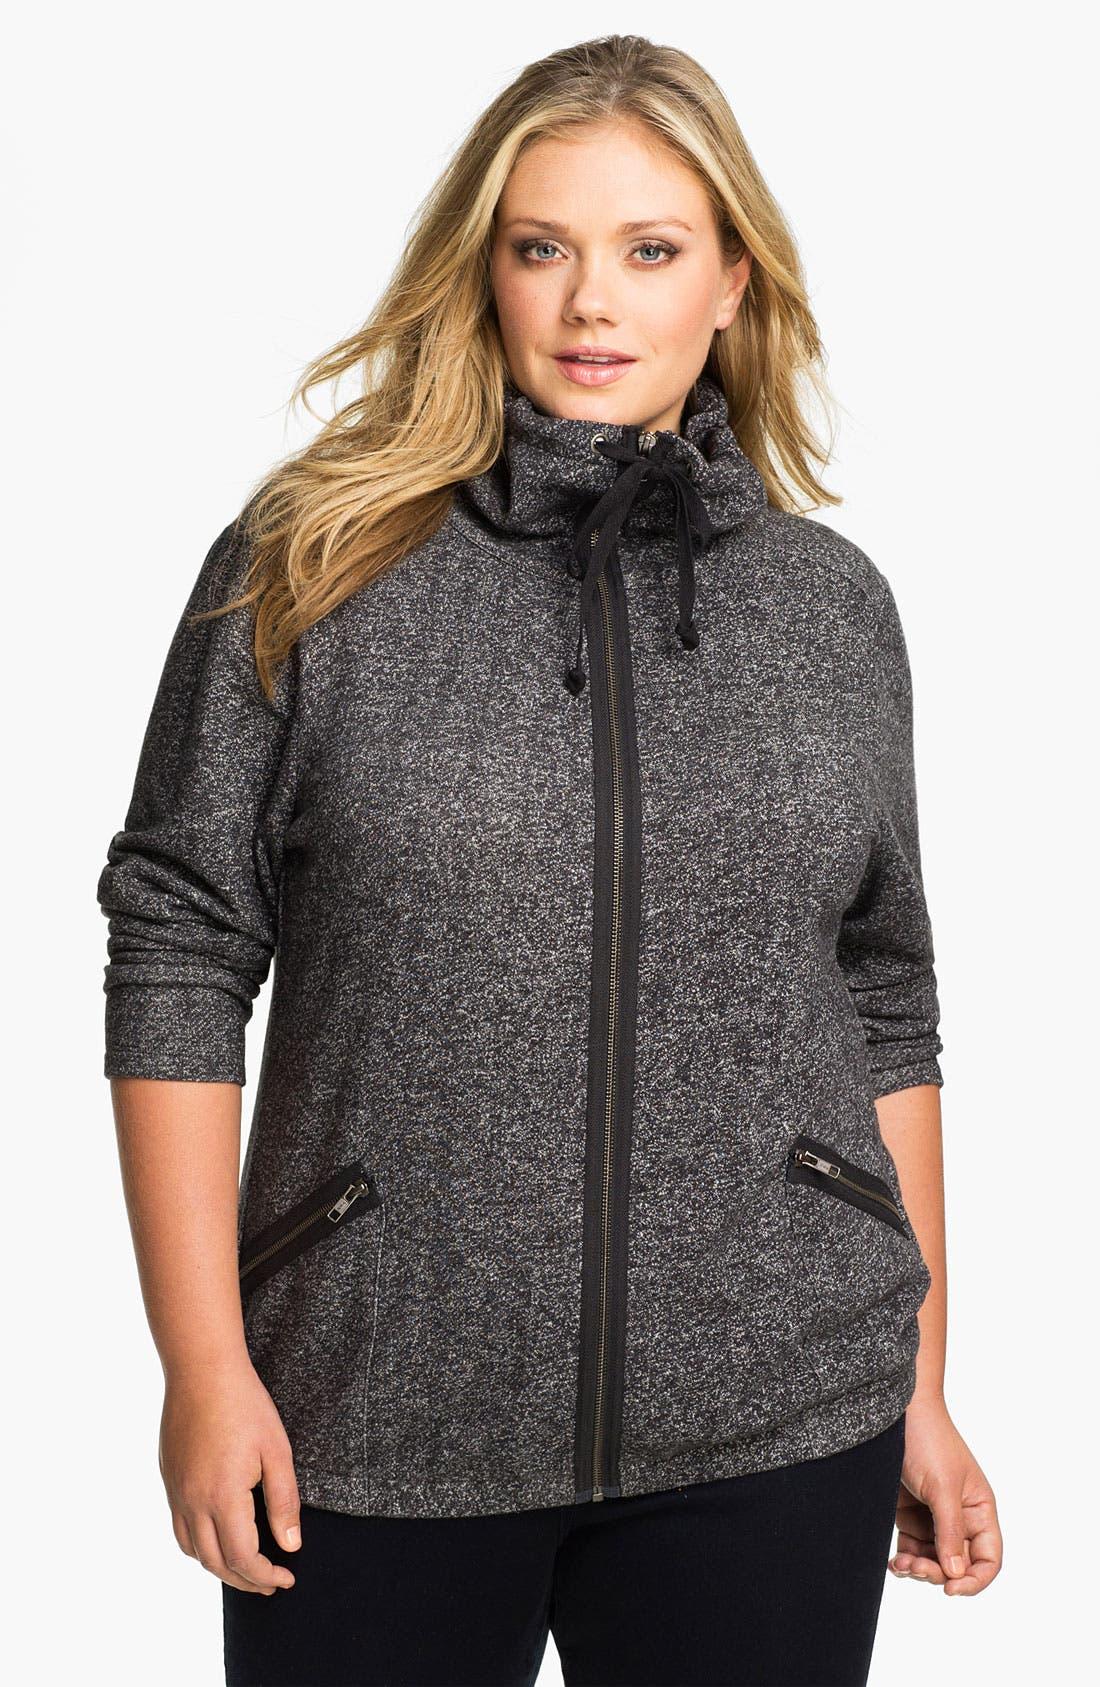 Alternate Image 1 Selected - Sejour 'Weekend' Zip Front Jacket (Plus)